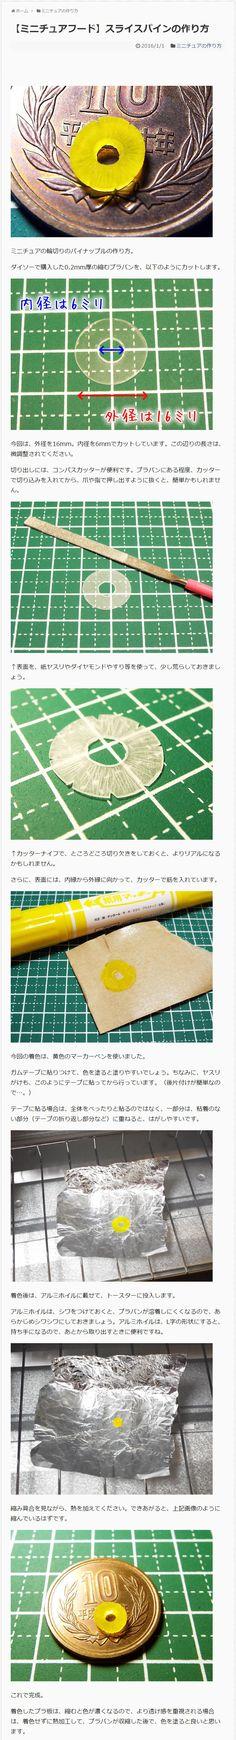 Making a Slice of Pineapple with Opakeplastic / Polyolefin Shrink Film (POF)   ミニチュアフード】スライスパインの作り方   以收縮膠/熱縮膠製作波蘿片